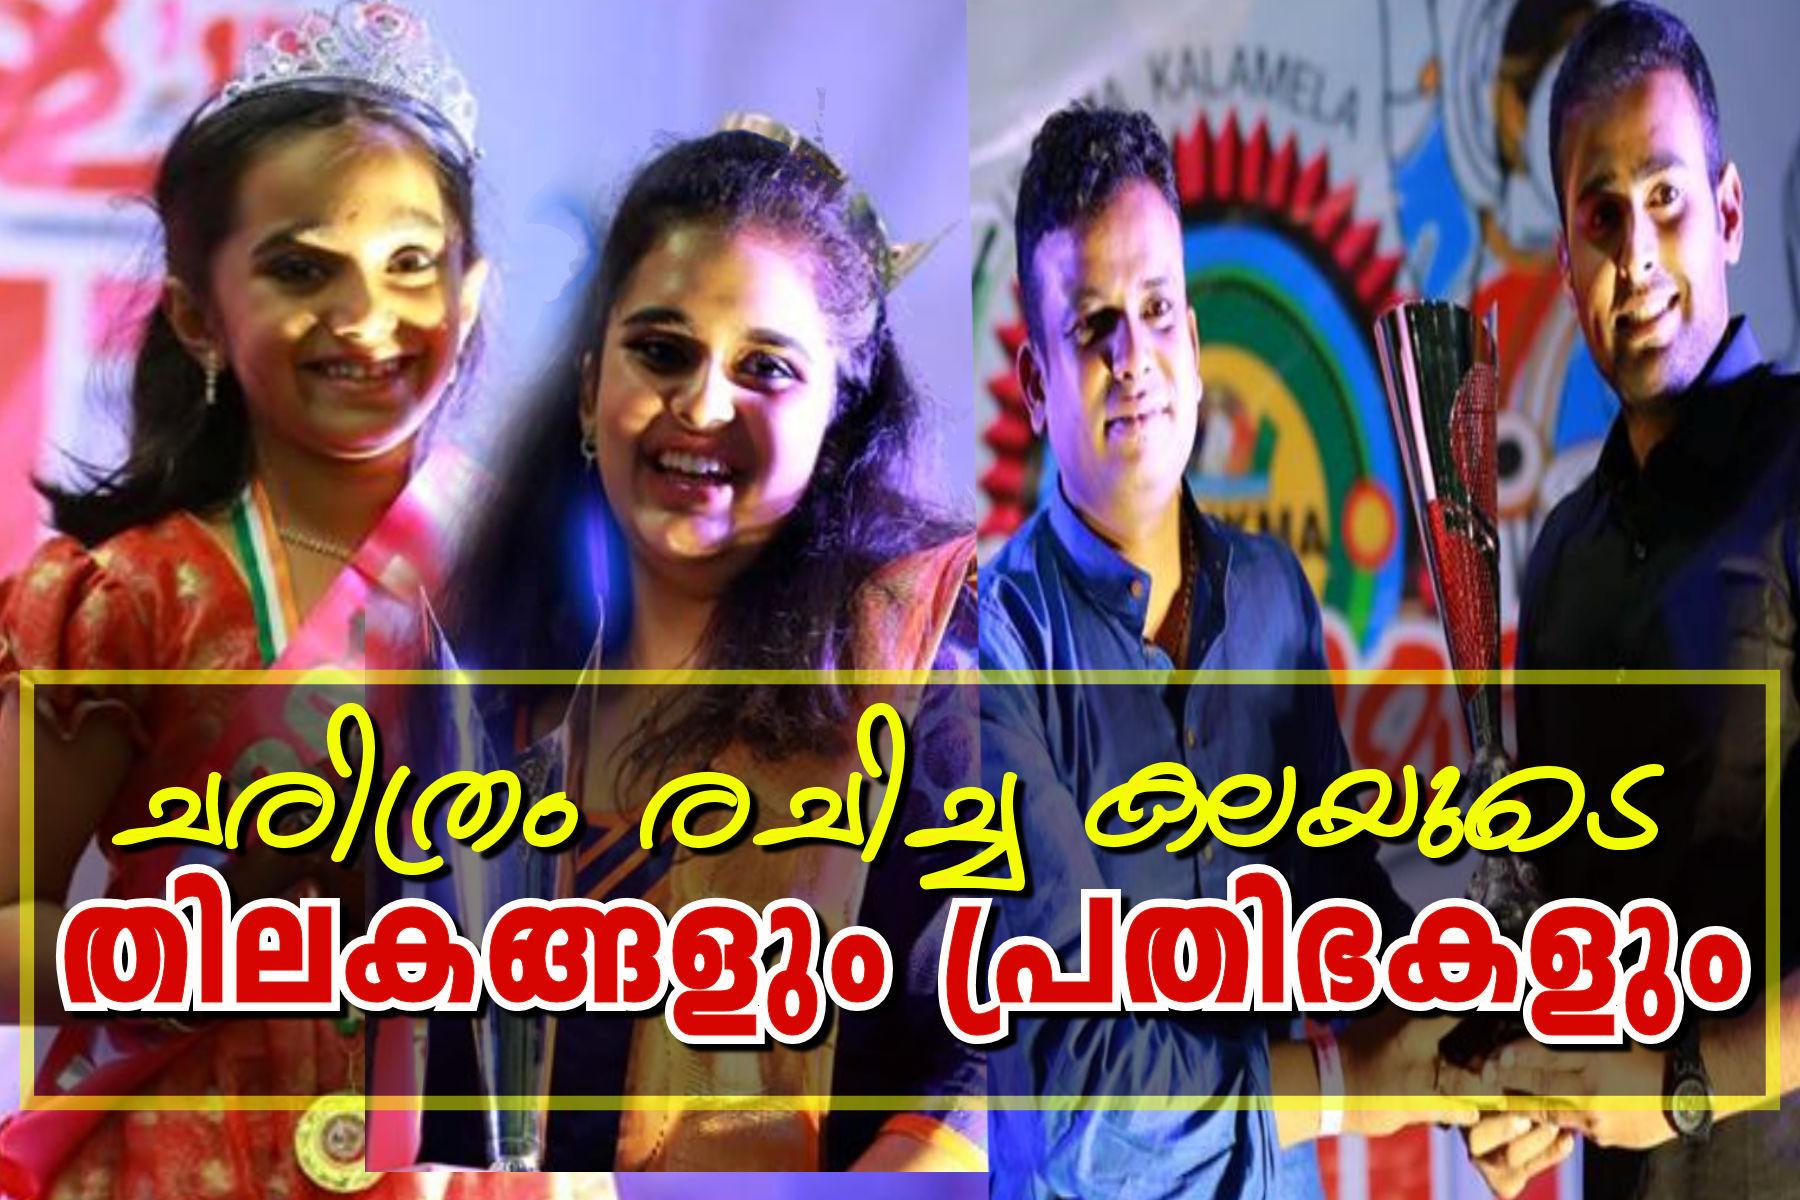 http://uukmanews.com/kalathialakam-prathibha/